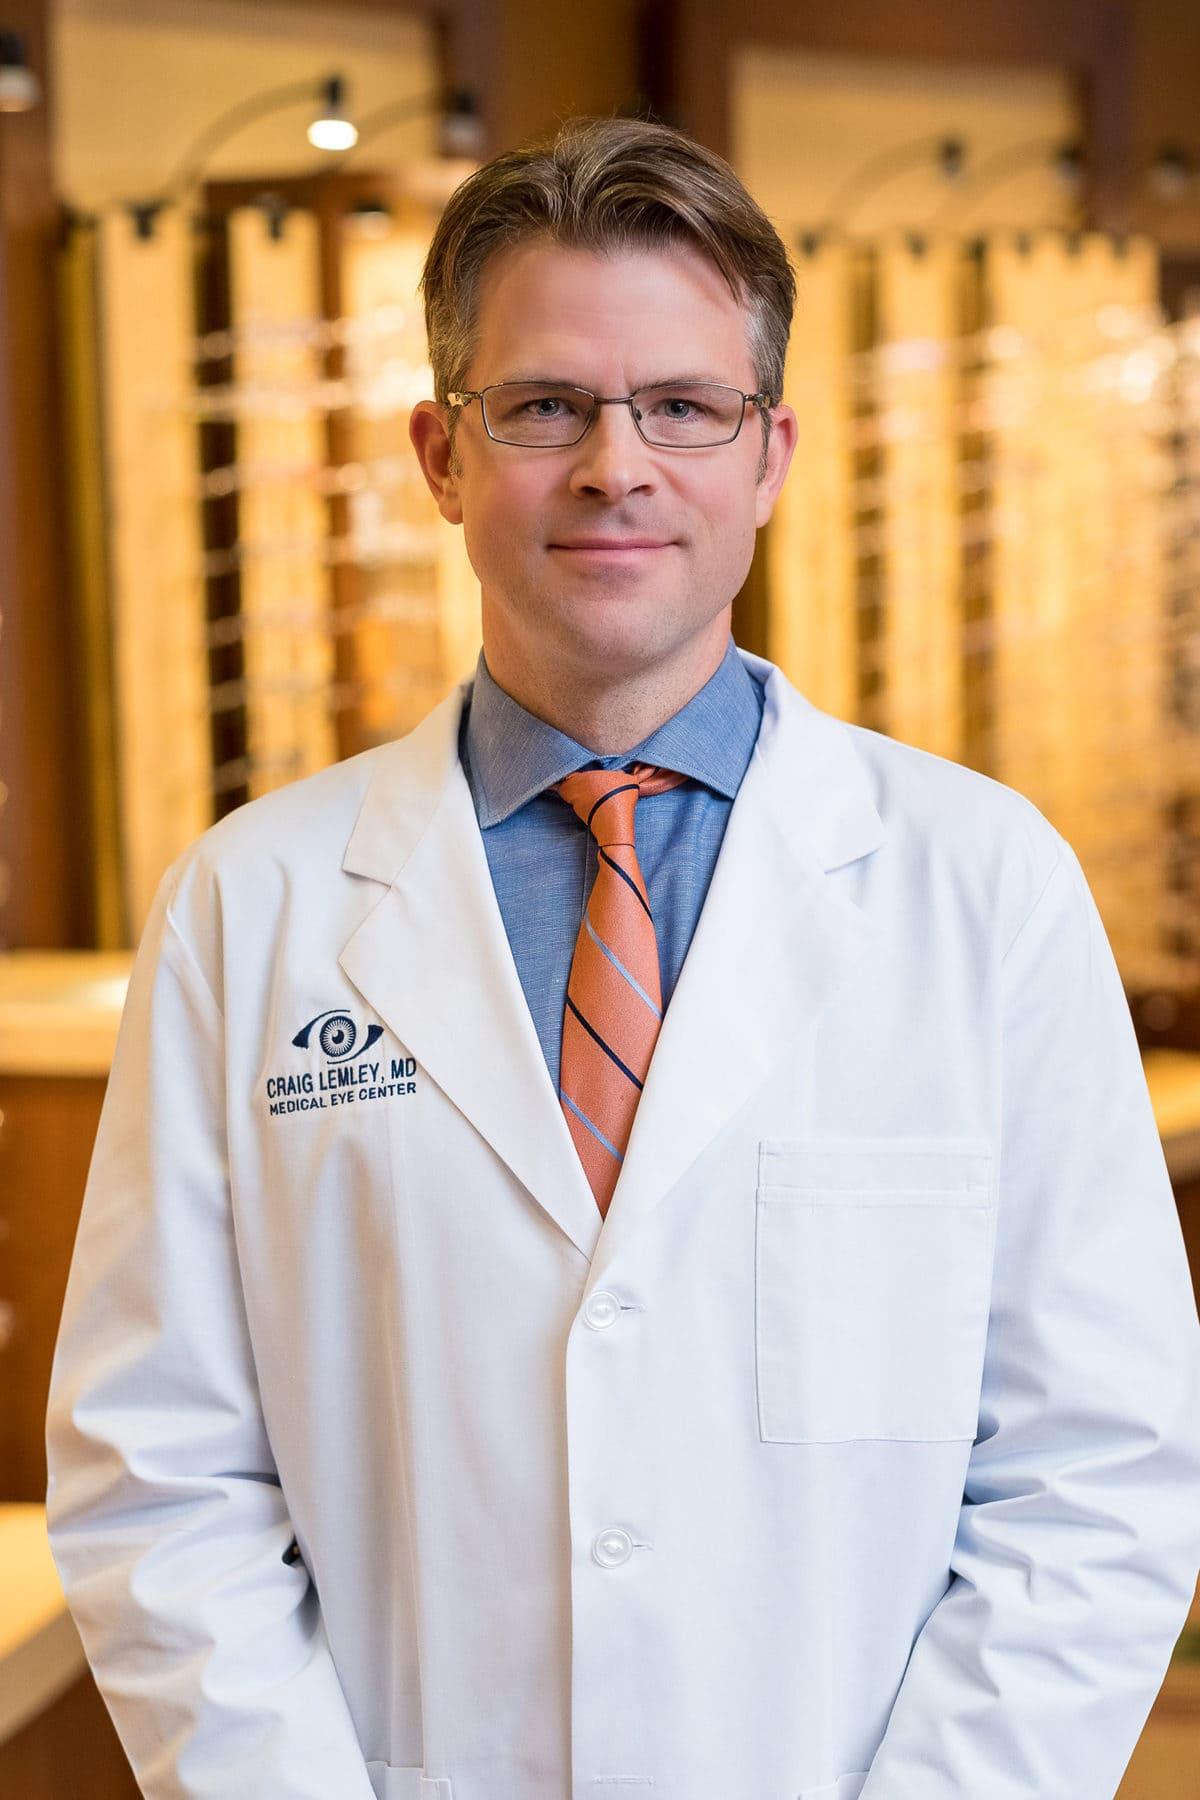 Craig Lemley, MD